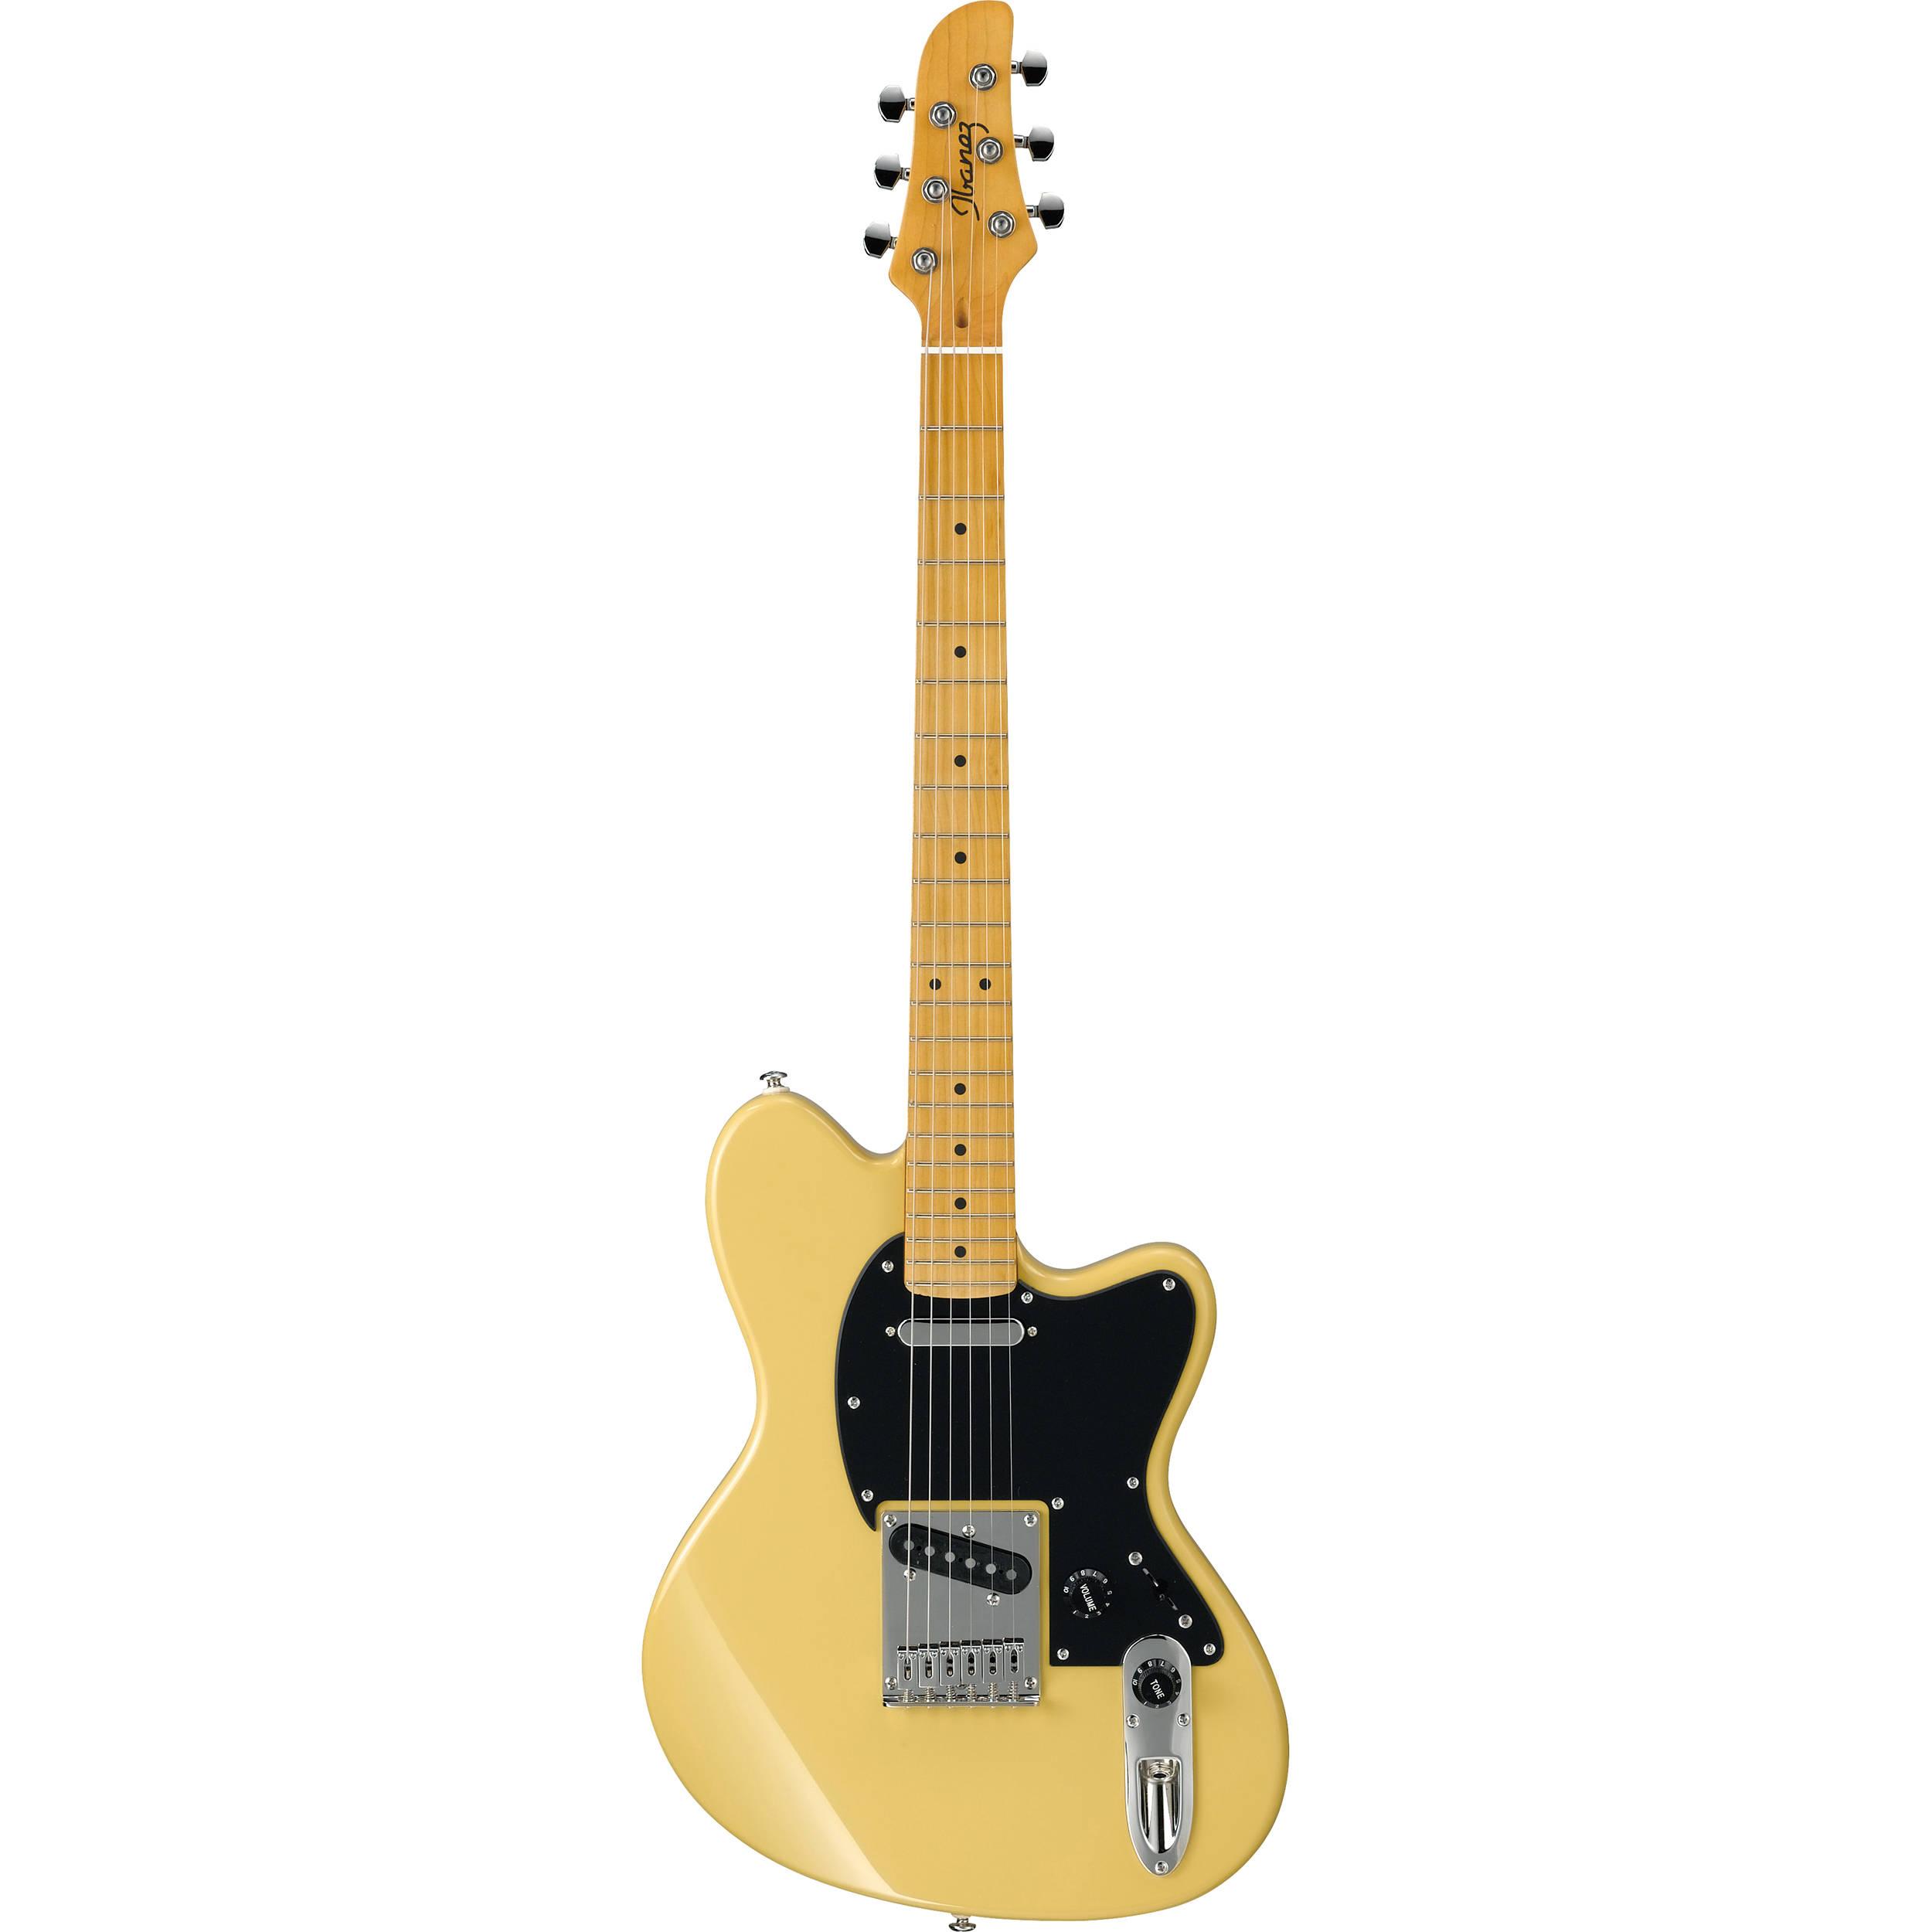 ibanez tm302bm talman standard series electric guitar tm302bmmst. Black Bedroom Furniture Sets. Home Design Ideas